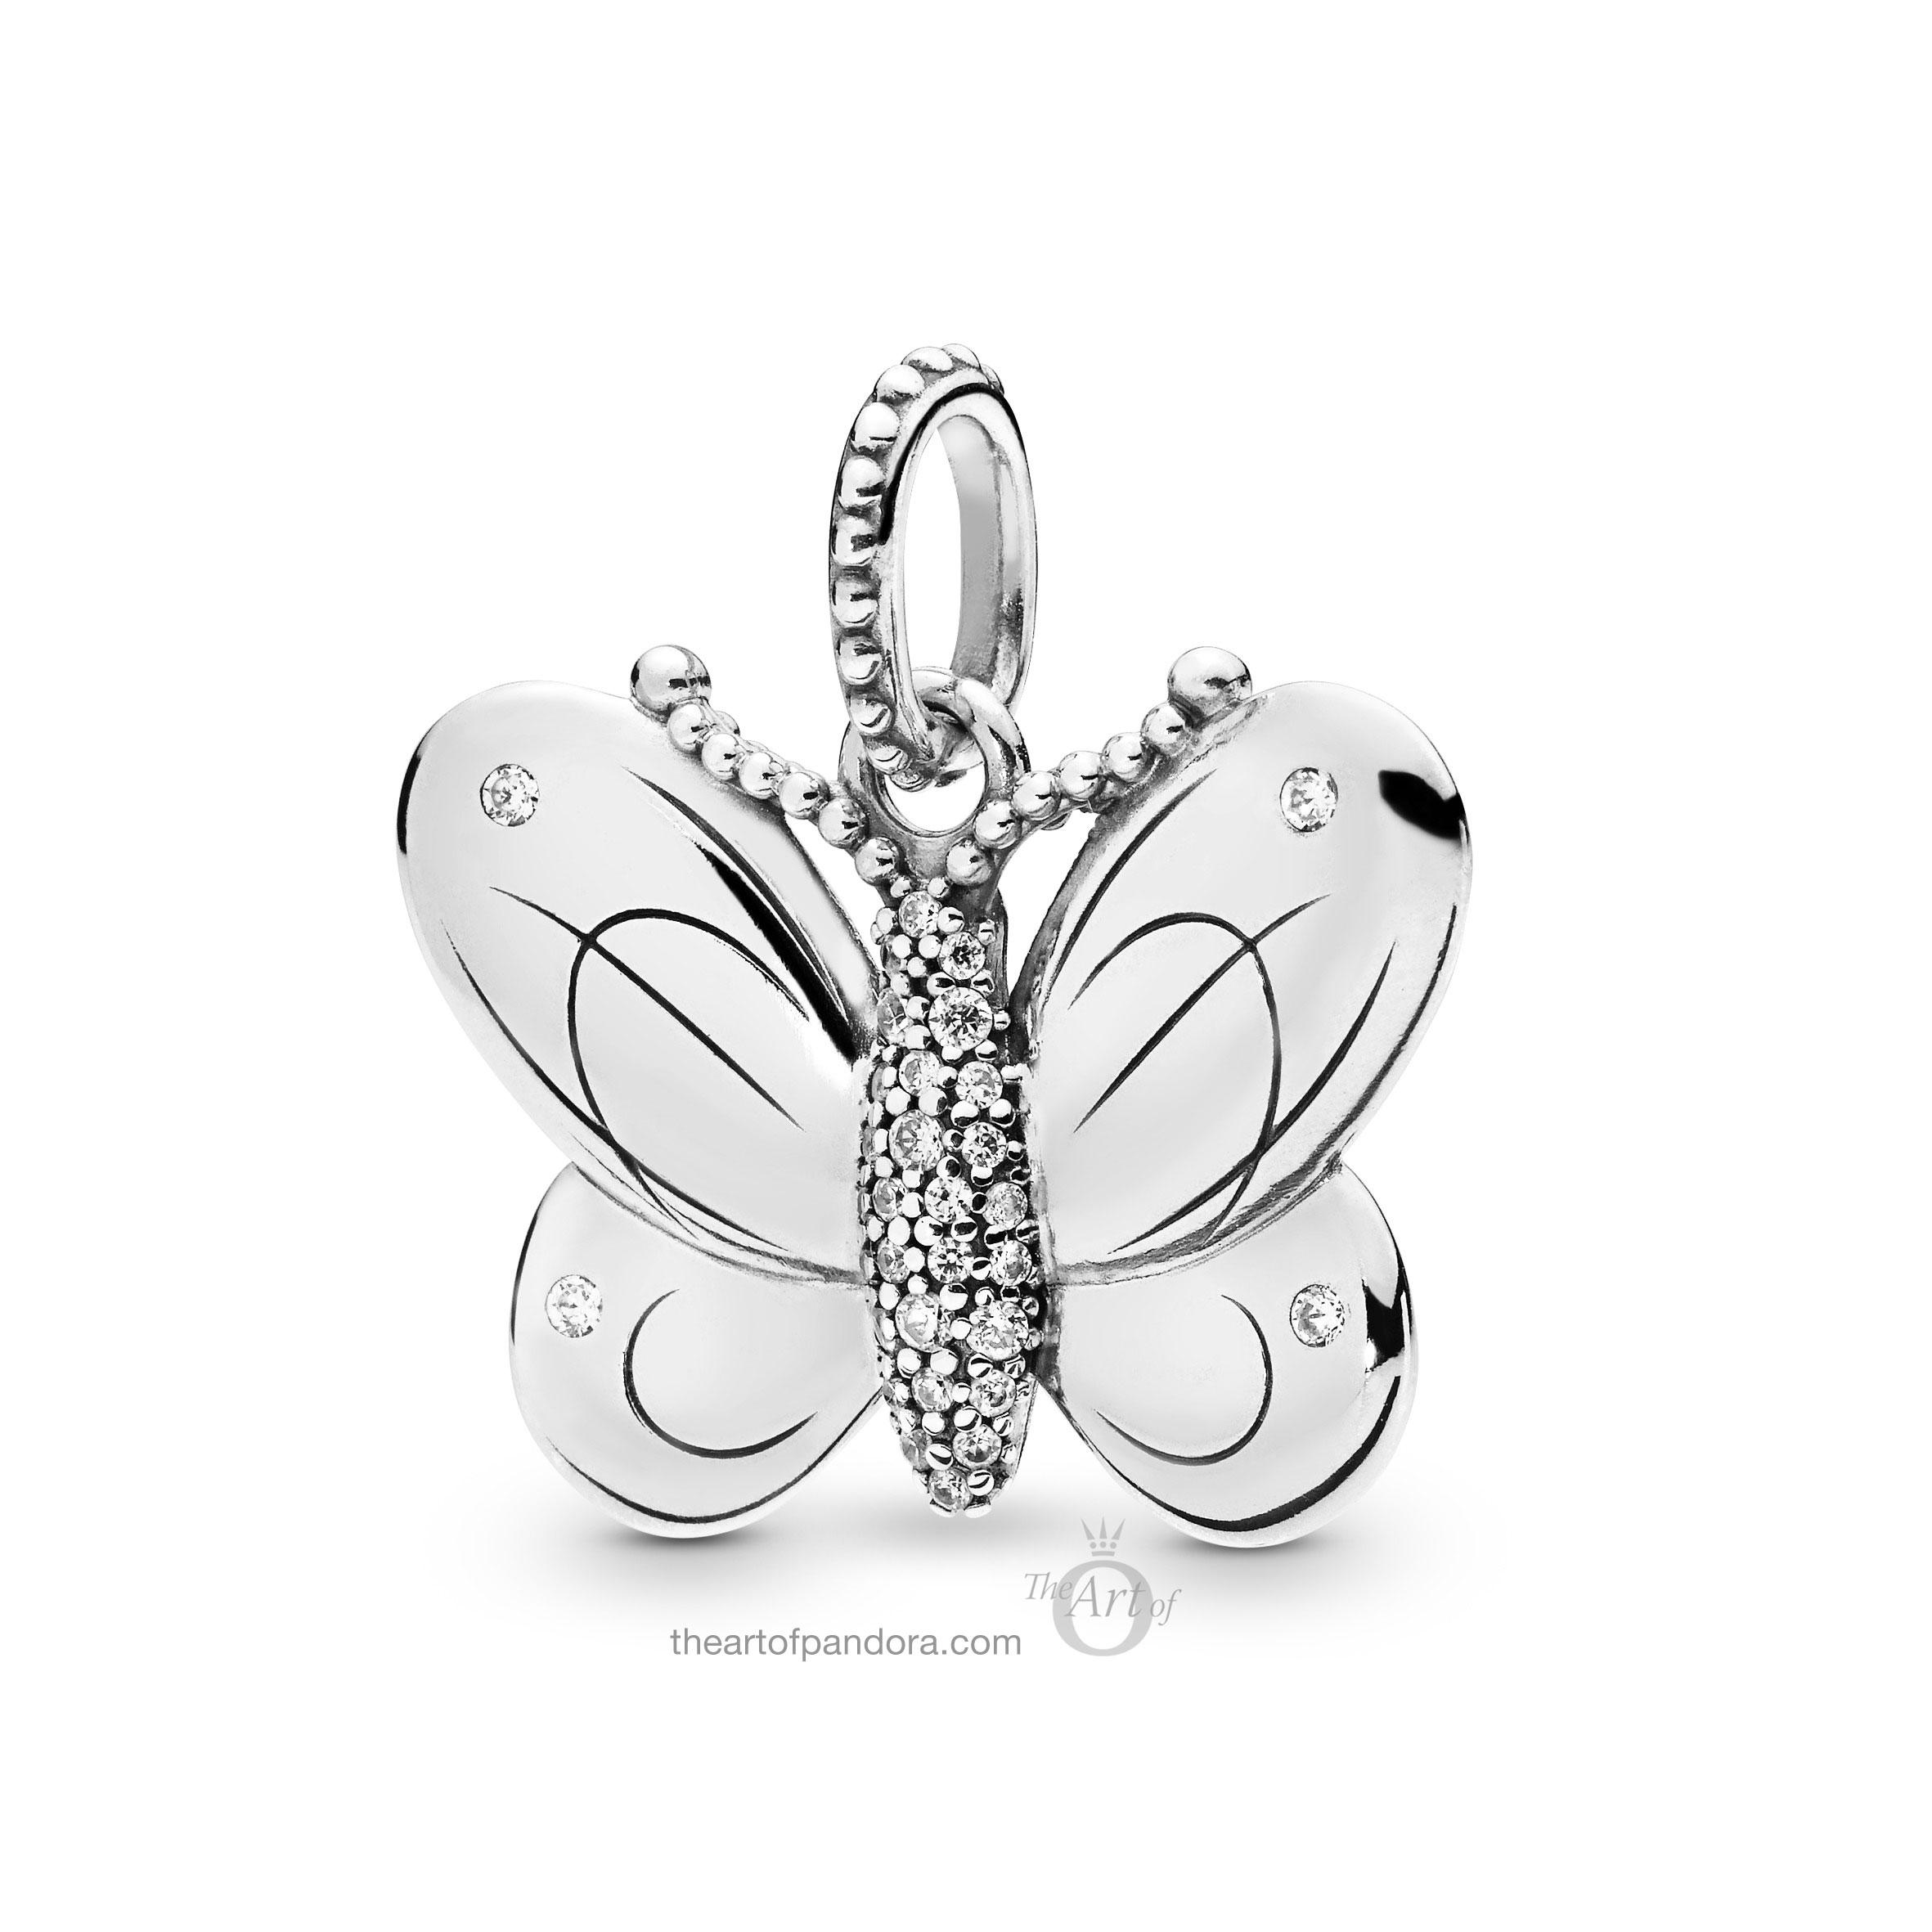 397933cz Pandora Decorative Butterfly Pendant The Art Of Pandora